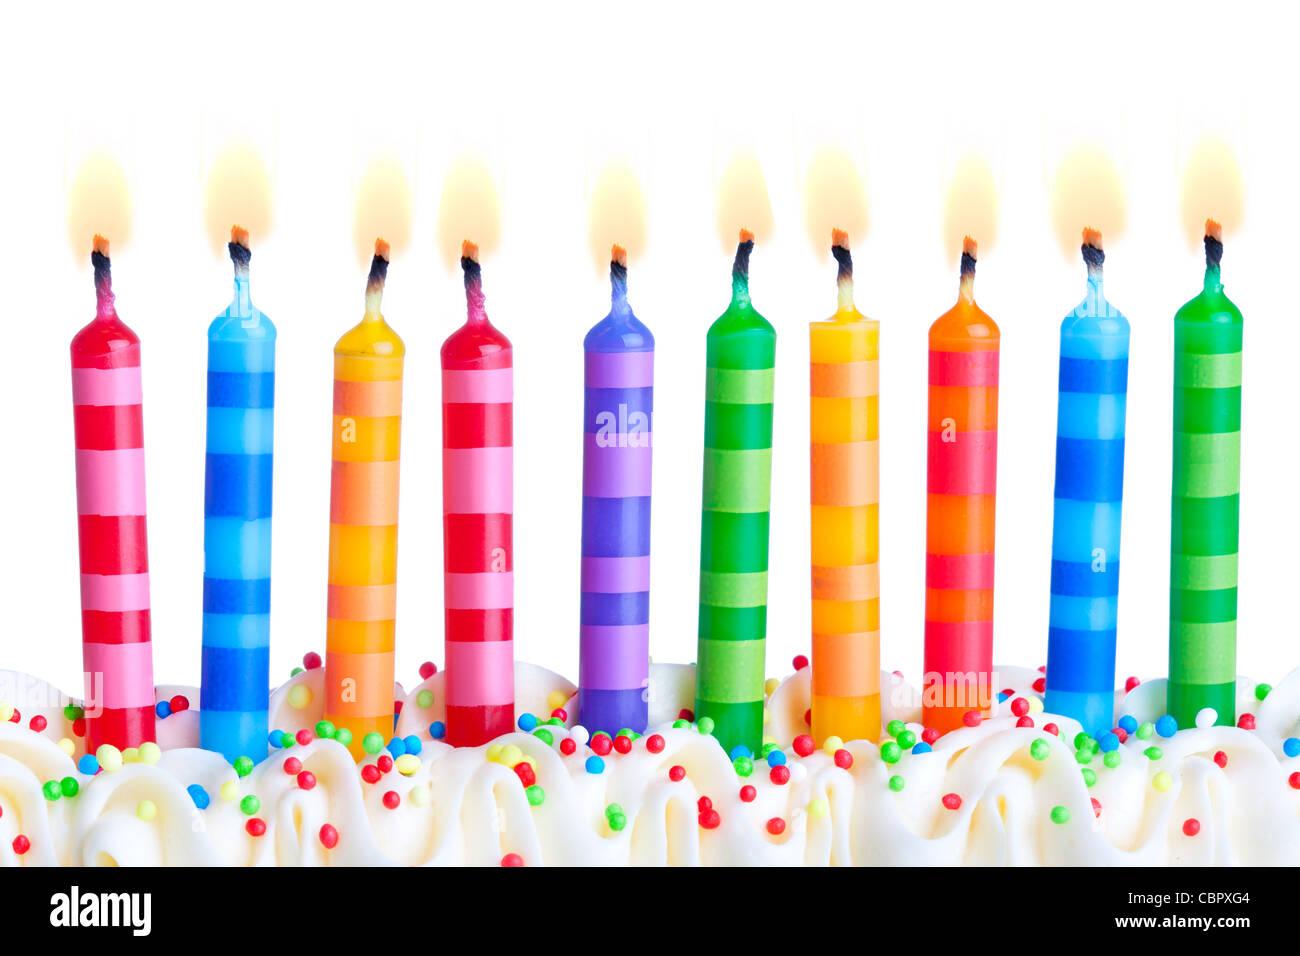 Birthday candles - Stock Image